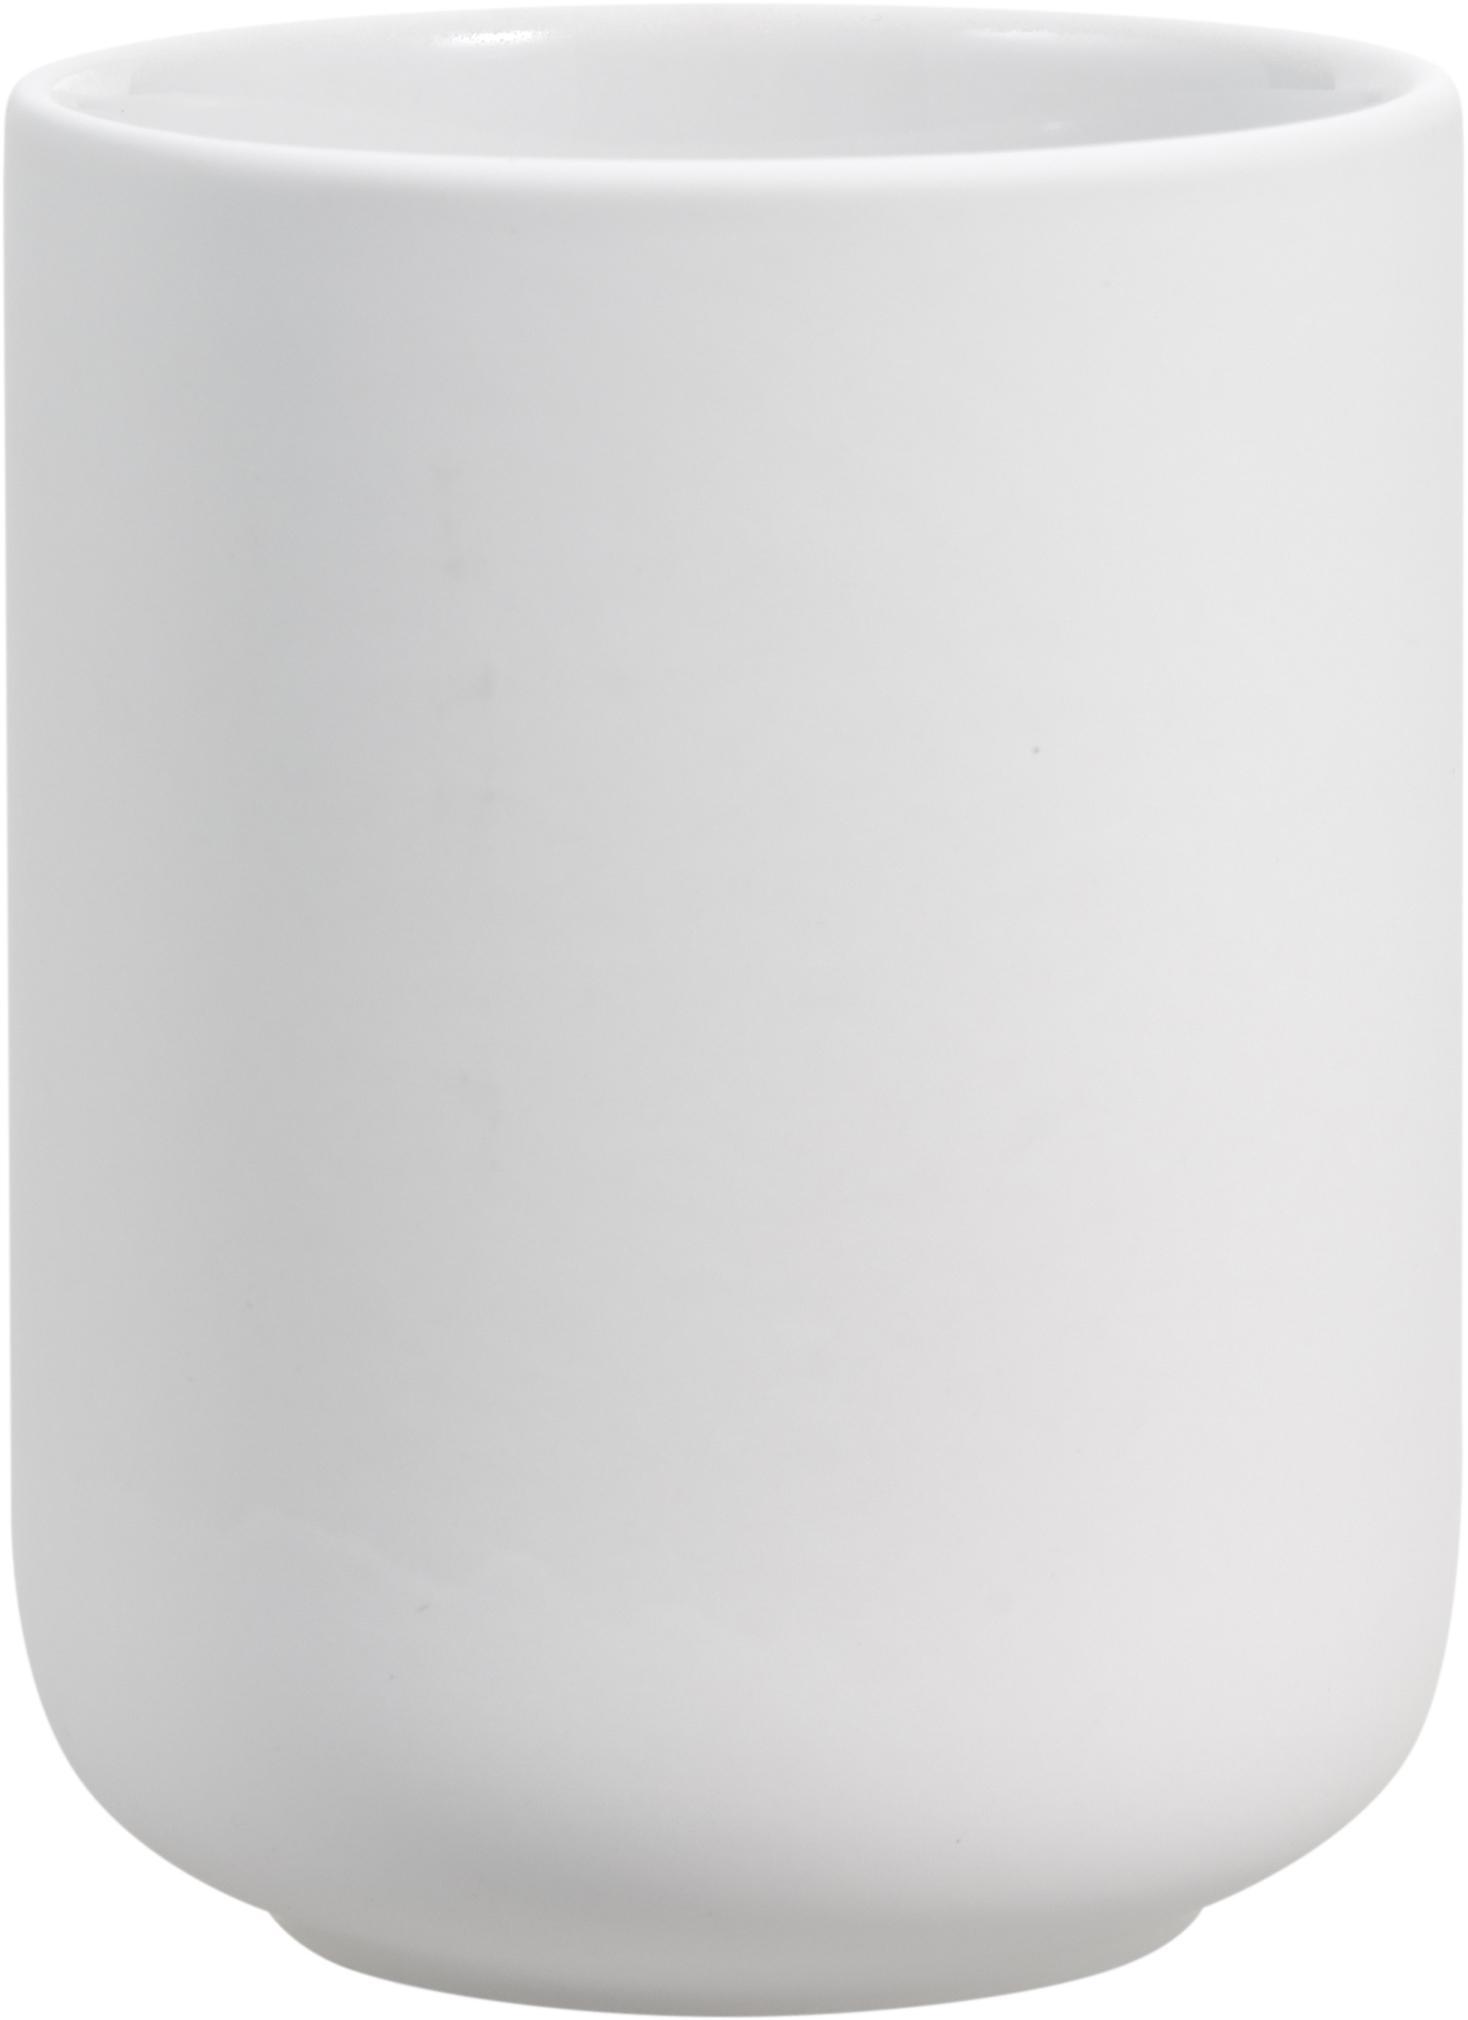 Porta spazzolini in terracotta Ume, Terracotta rivestita con superficie soft-touch (materiale sintetico), Bianco opaco, Ø 8 x Alt. 10 cm